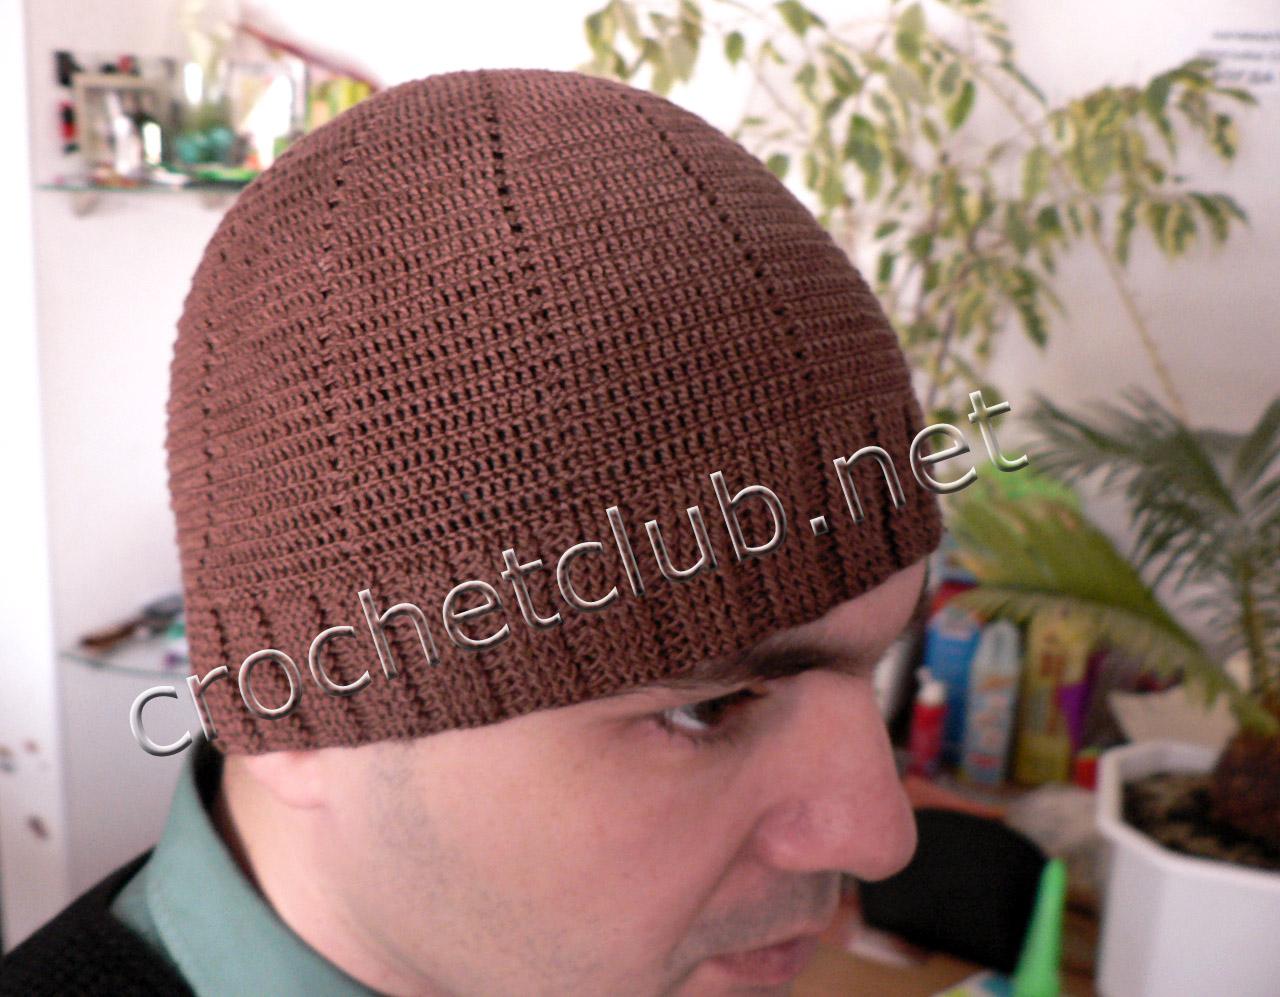 легкая мужская шапочка крючком вязание крючком блог настика